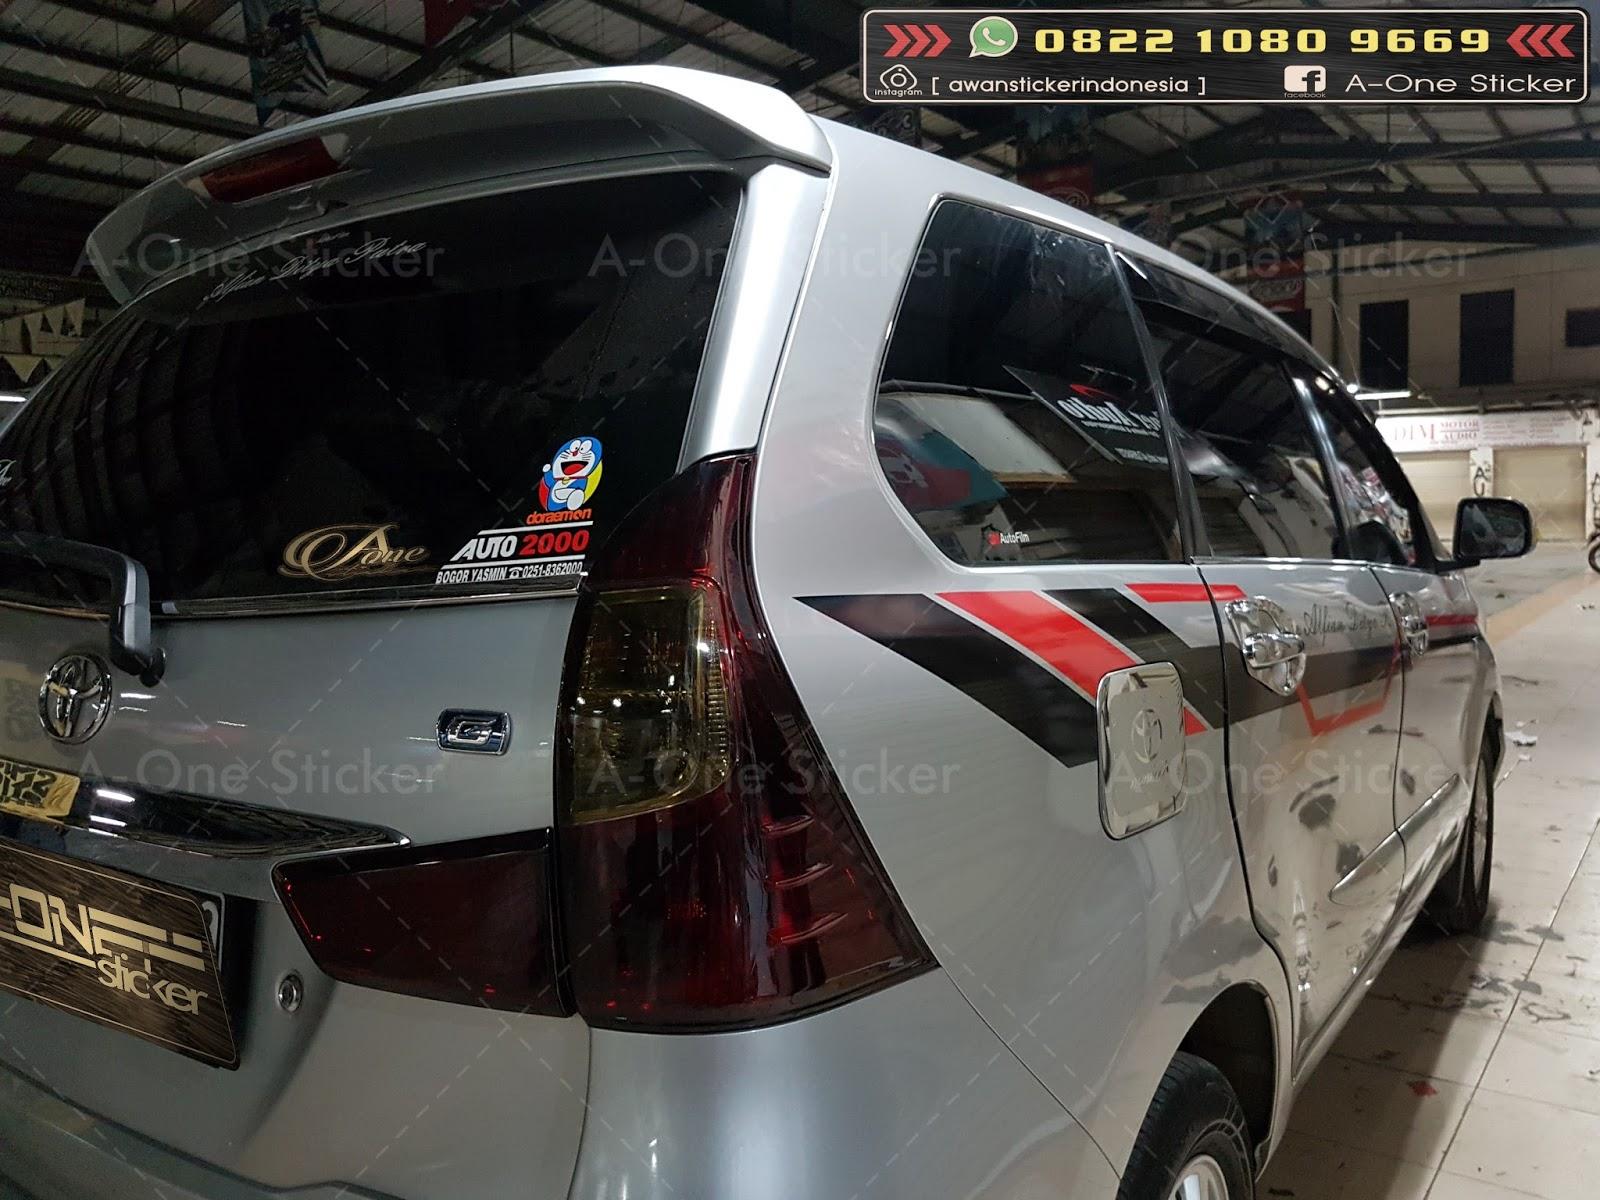 Cutting Sticker Grand New Avanza Toyota All Innova Venturer Mobil Modifikasi Depok Jakarta